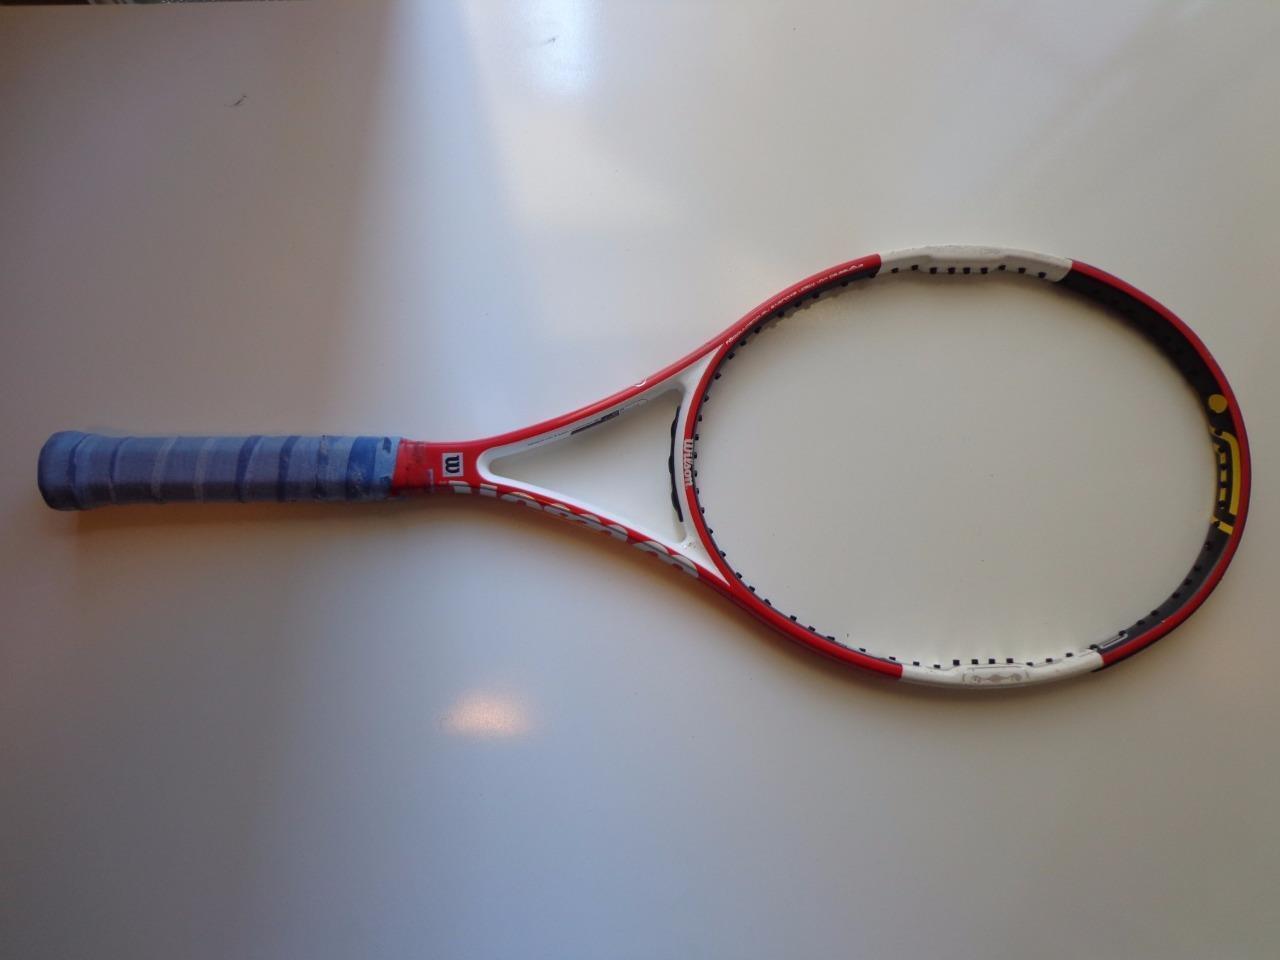 Wilson Ncode n code Six-One 95 head 16x18 11.7oz 4 5 8 grip Tennis Racquet